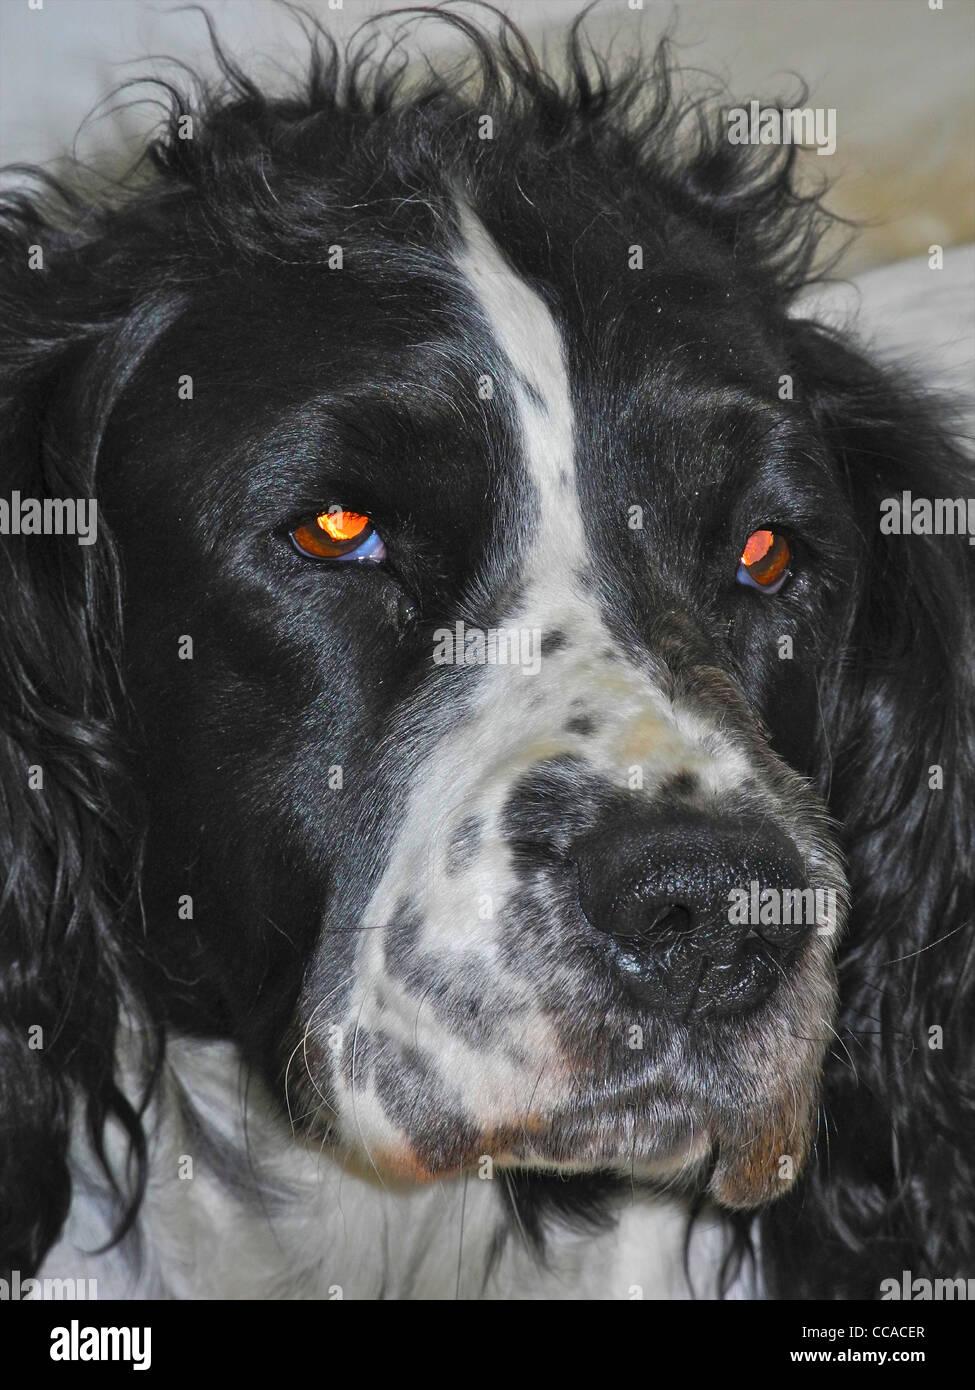 Teufel Hund böse Augen Auge Stockbild